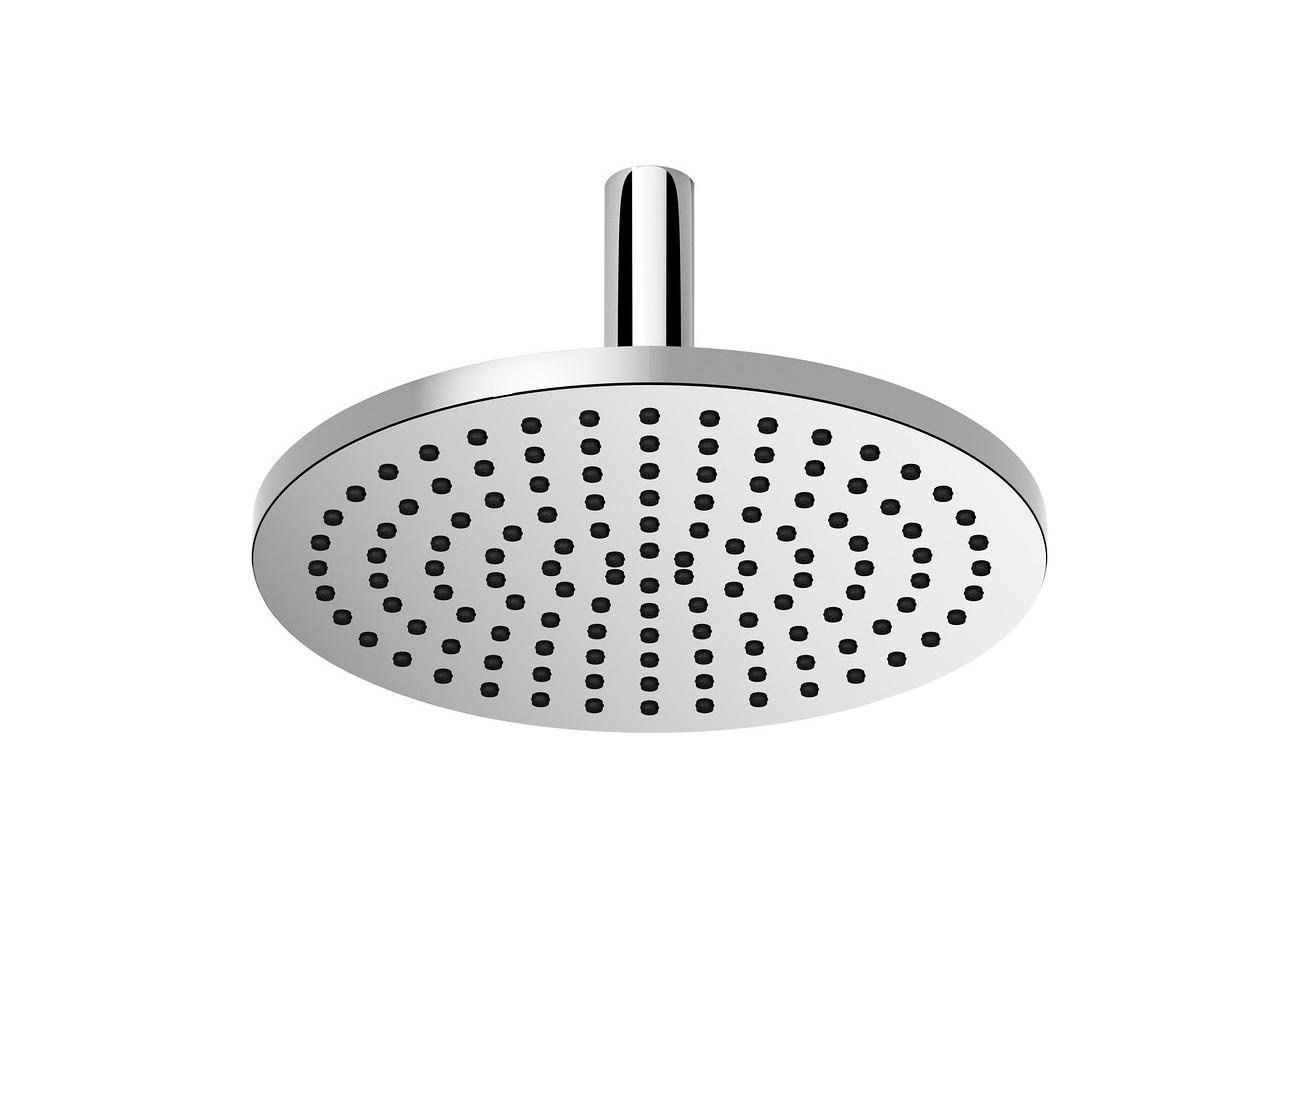 vaia rain shower shower taps mixers from dornbracht. Black Bedroom Furniture Sets. Home Design Ideas